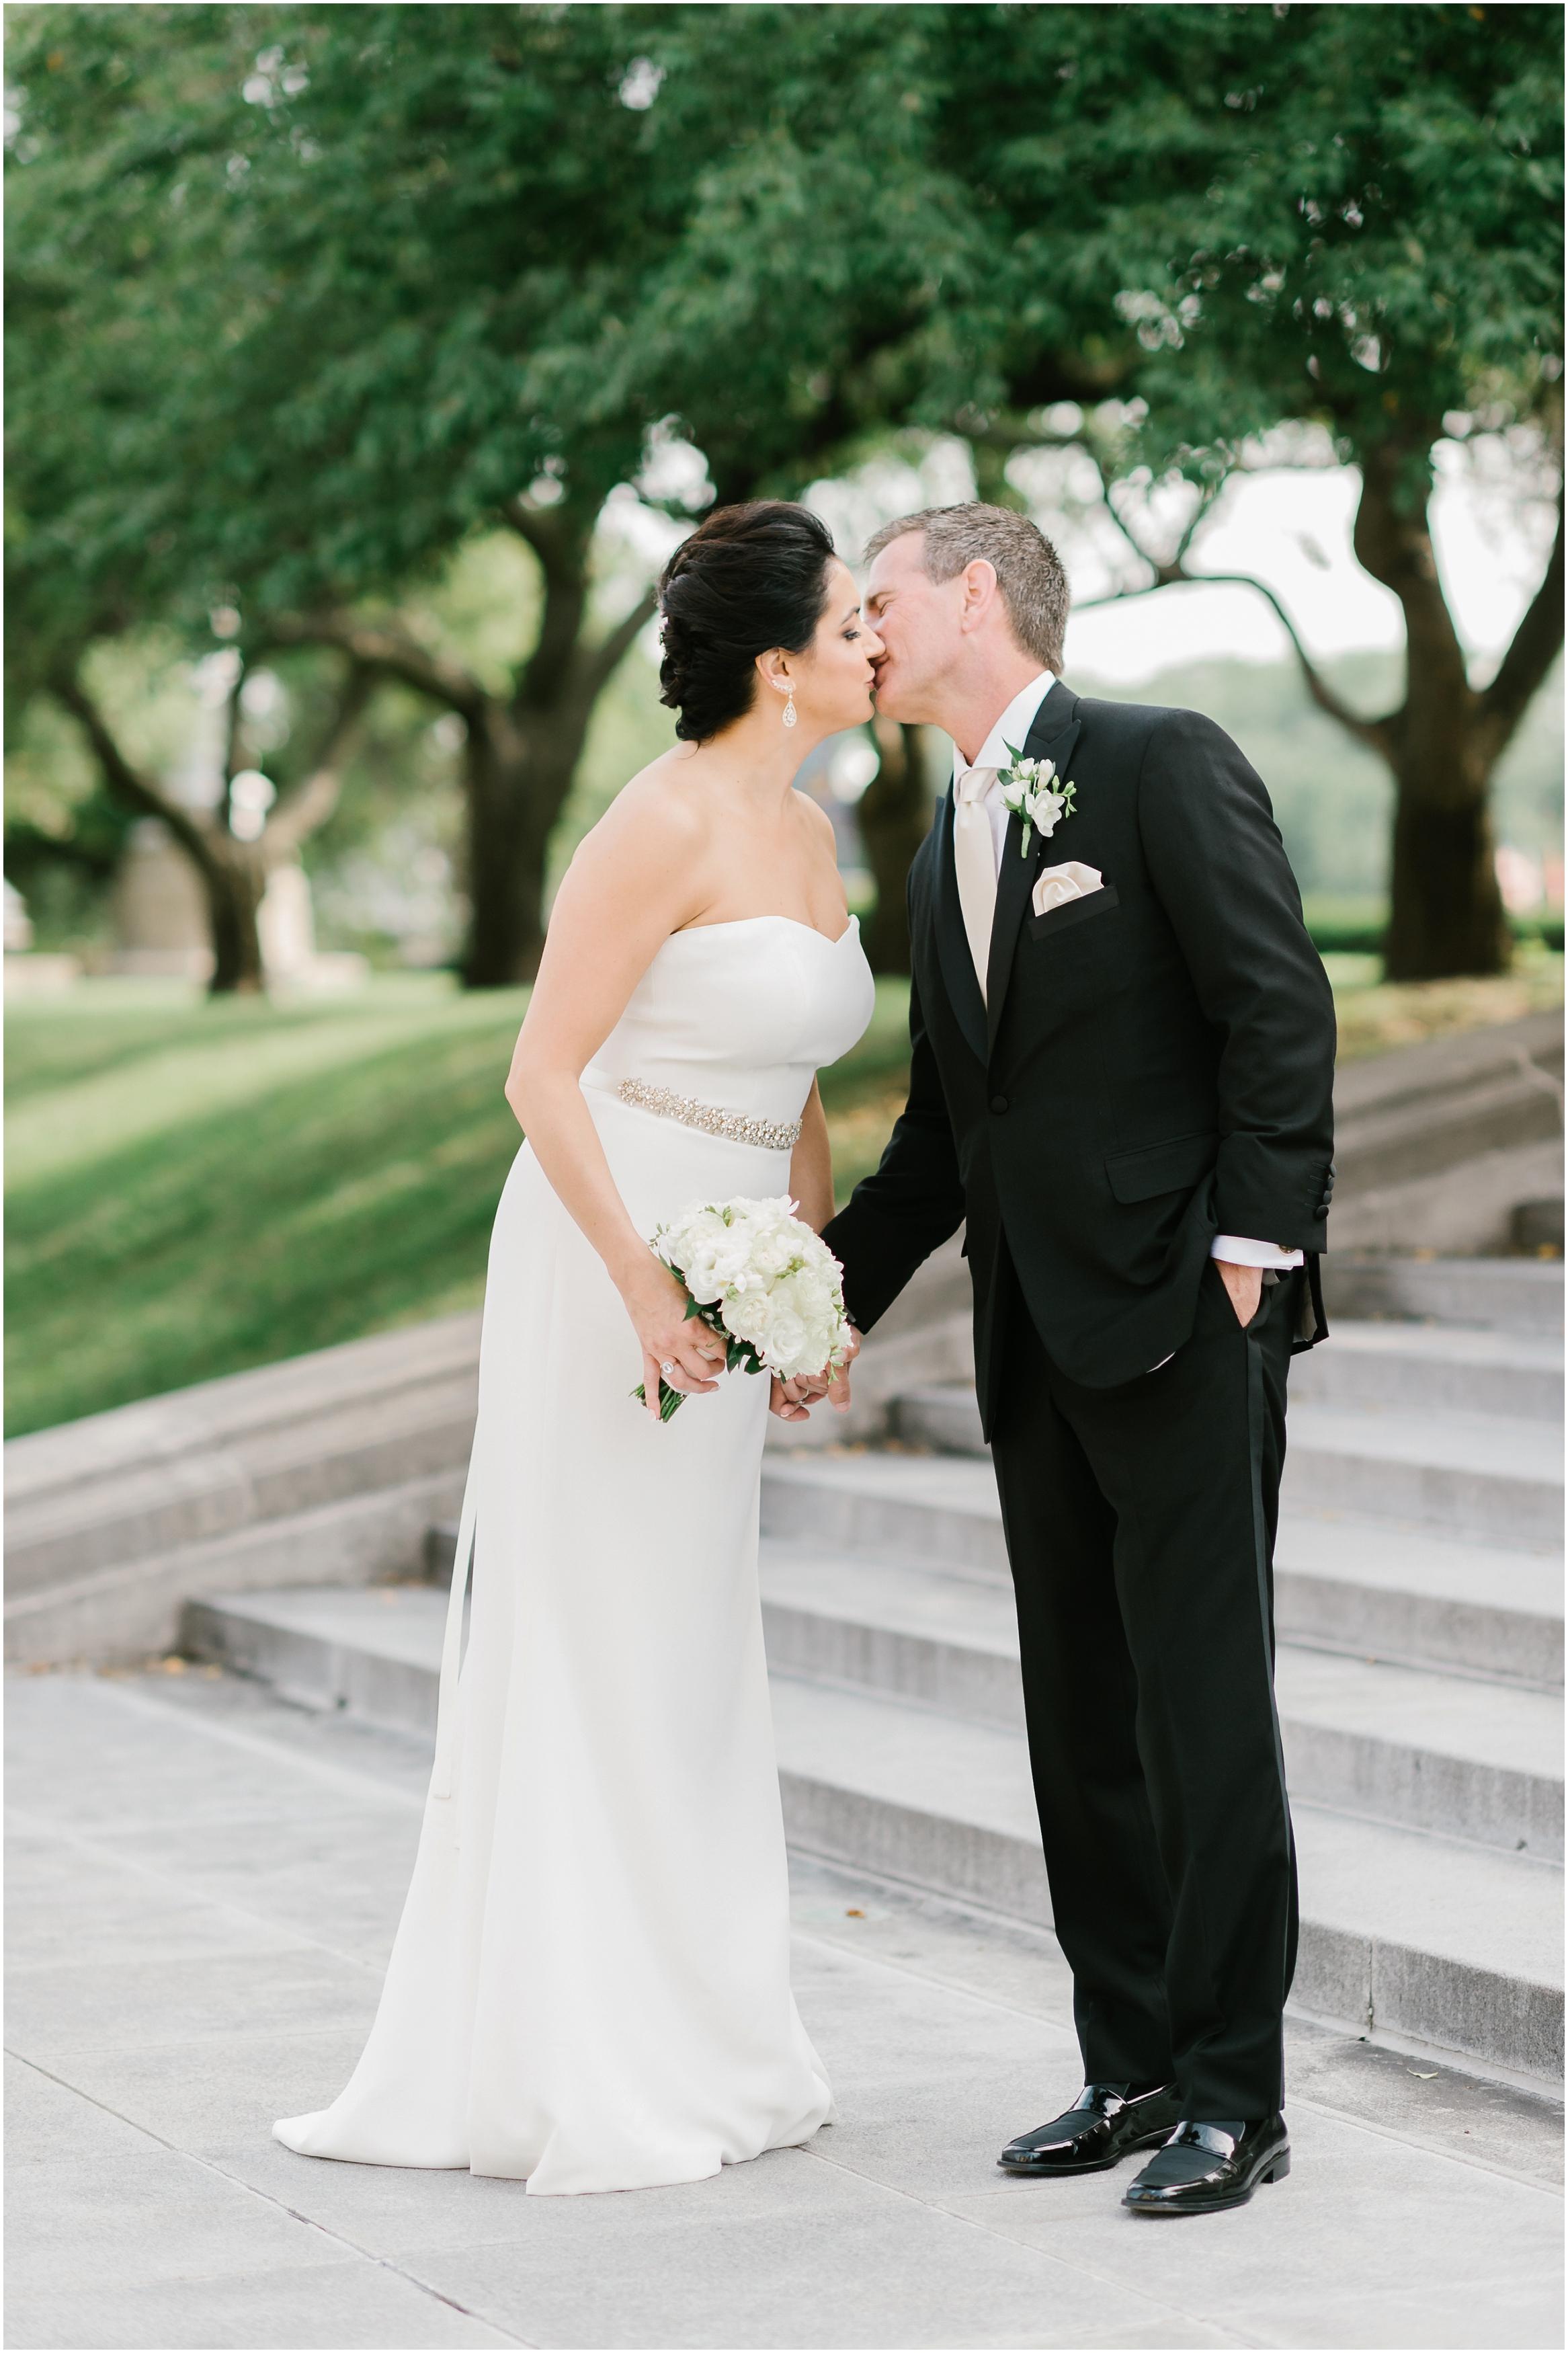 Rebecca_Shehorn_Photography_Indianapolis_Wedding_Photographer_8554.jpg